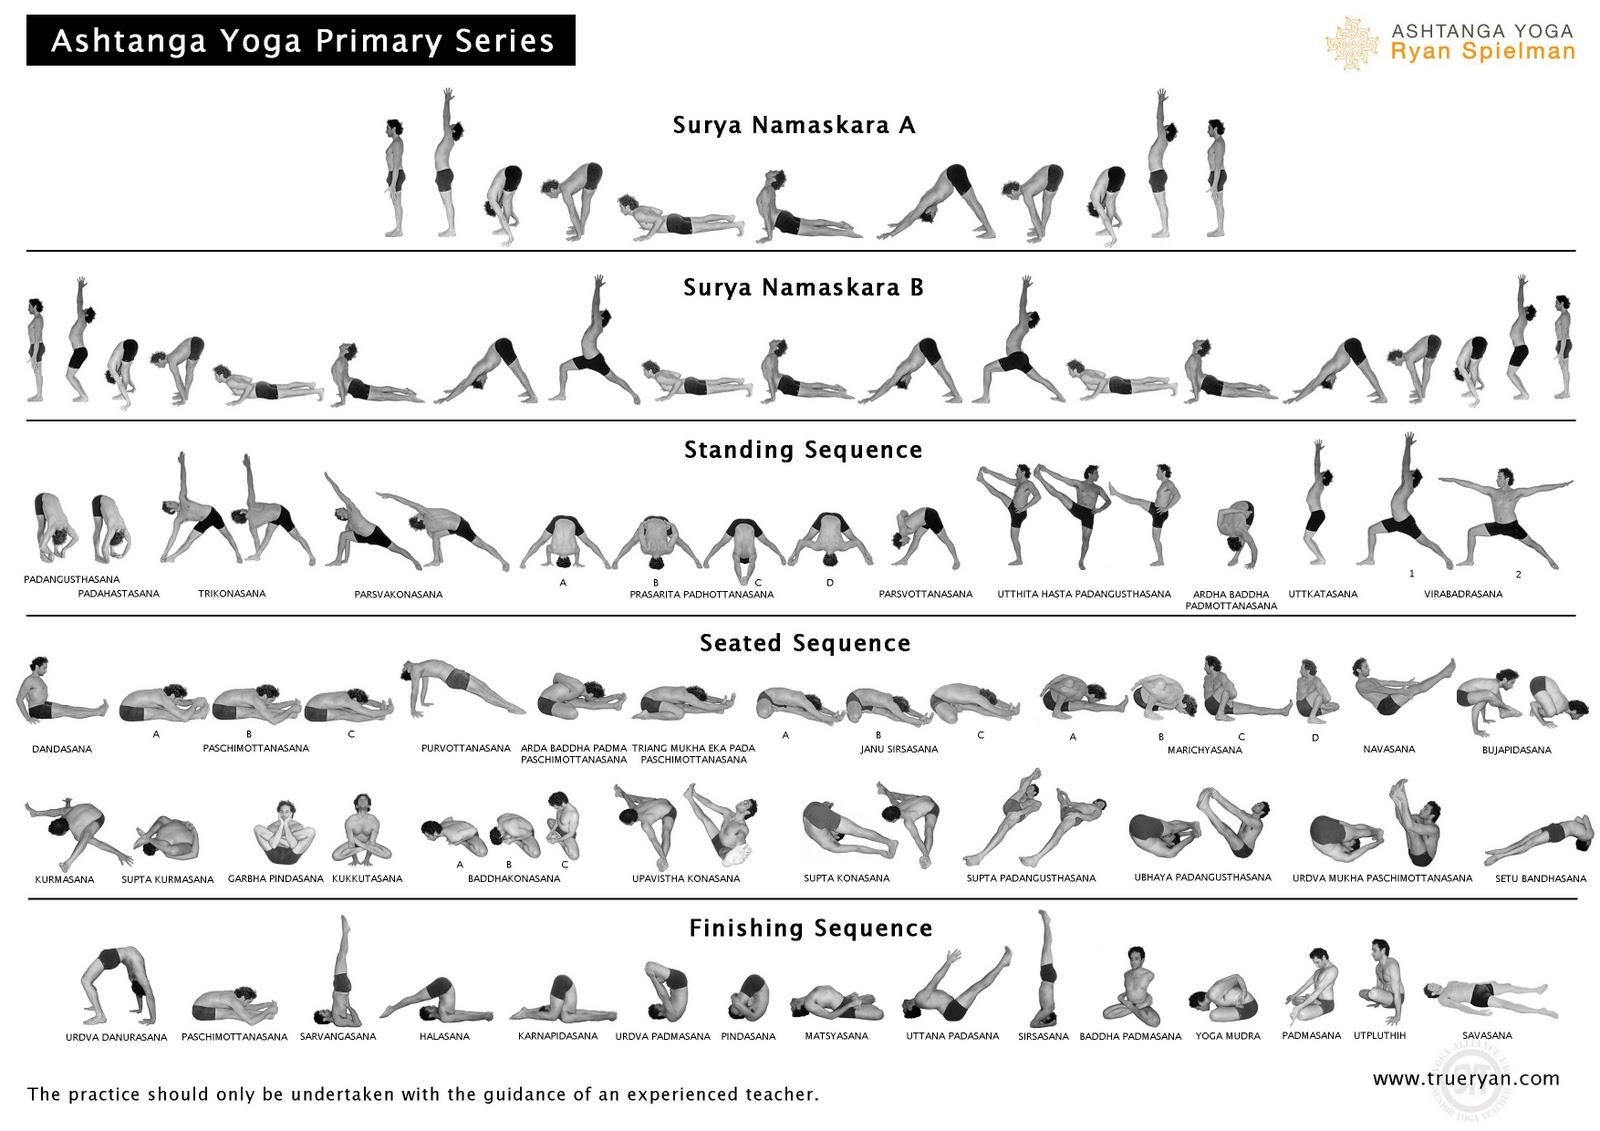 premiere-serie-ashtanga-vinyasa-yoga.jpg